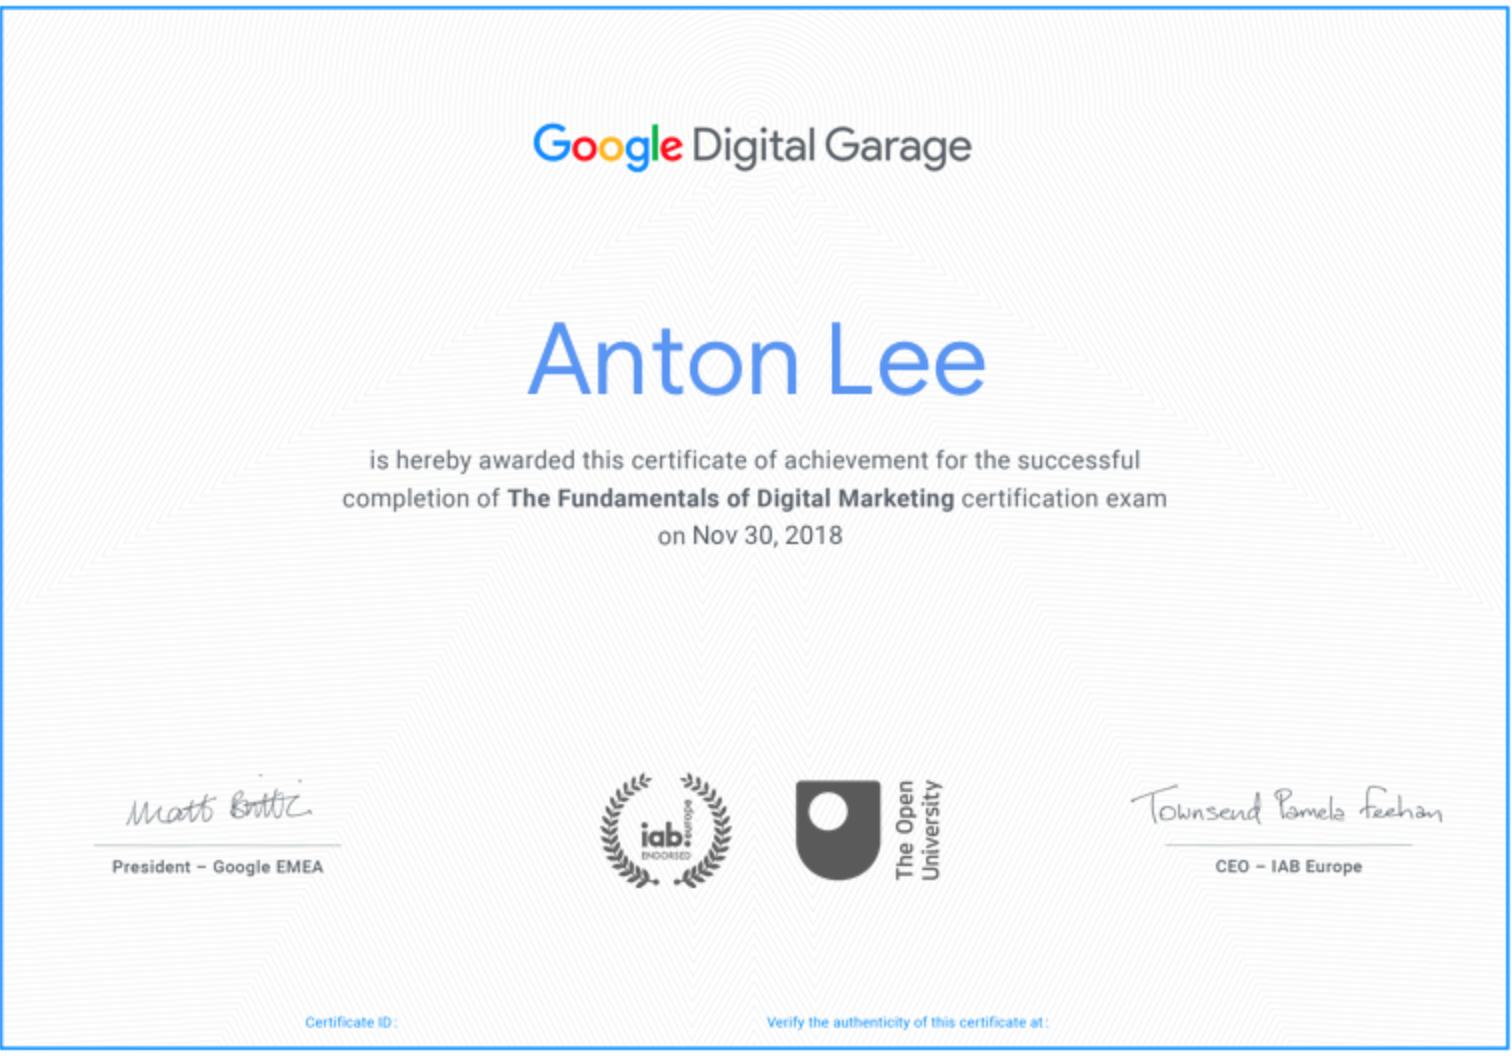 Chứng chỉ từ Google Digital Garage